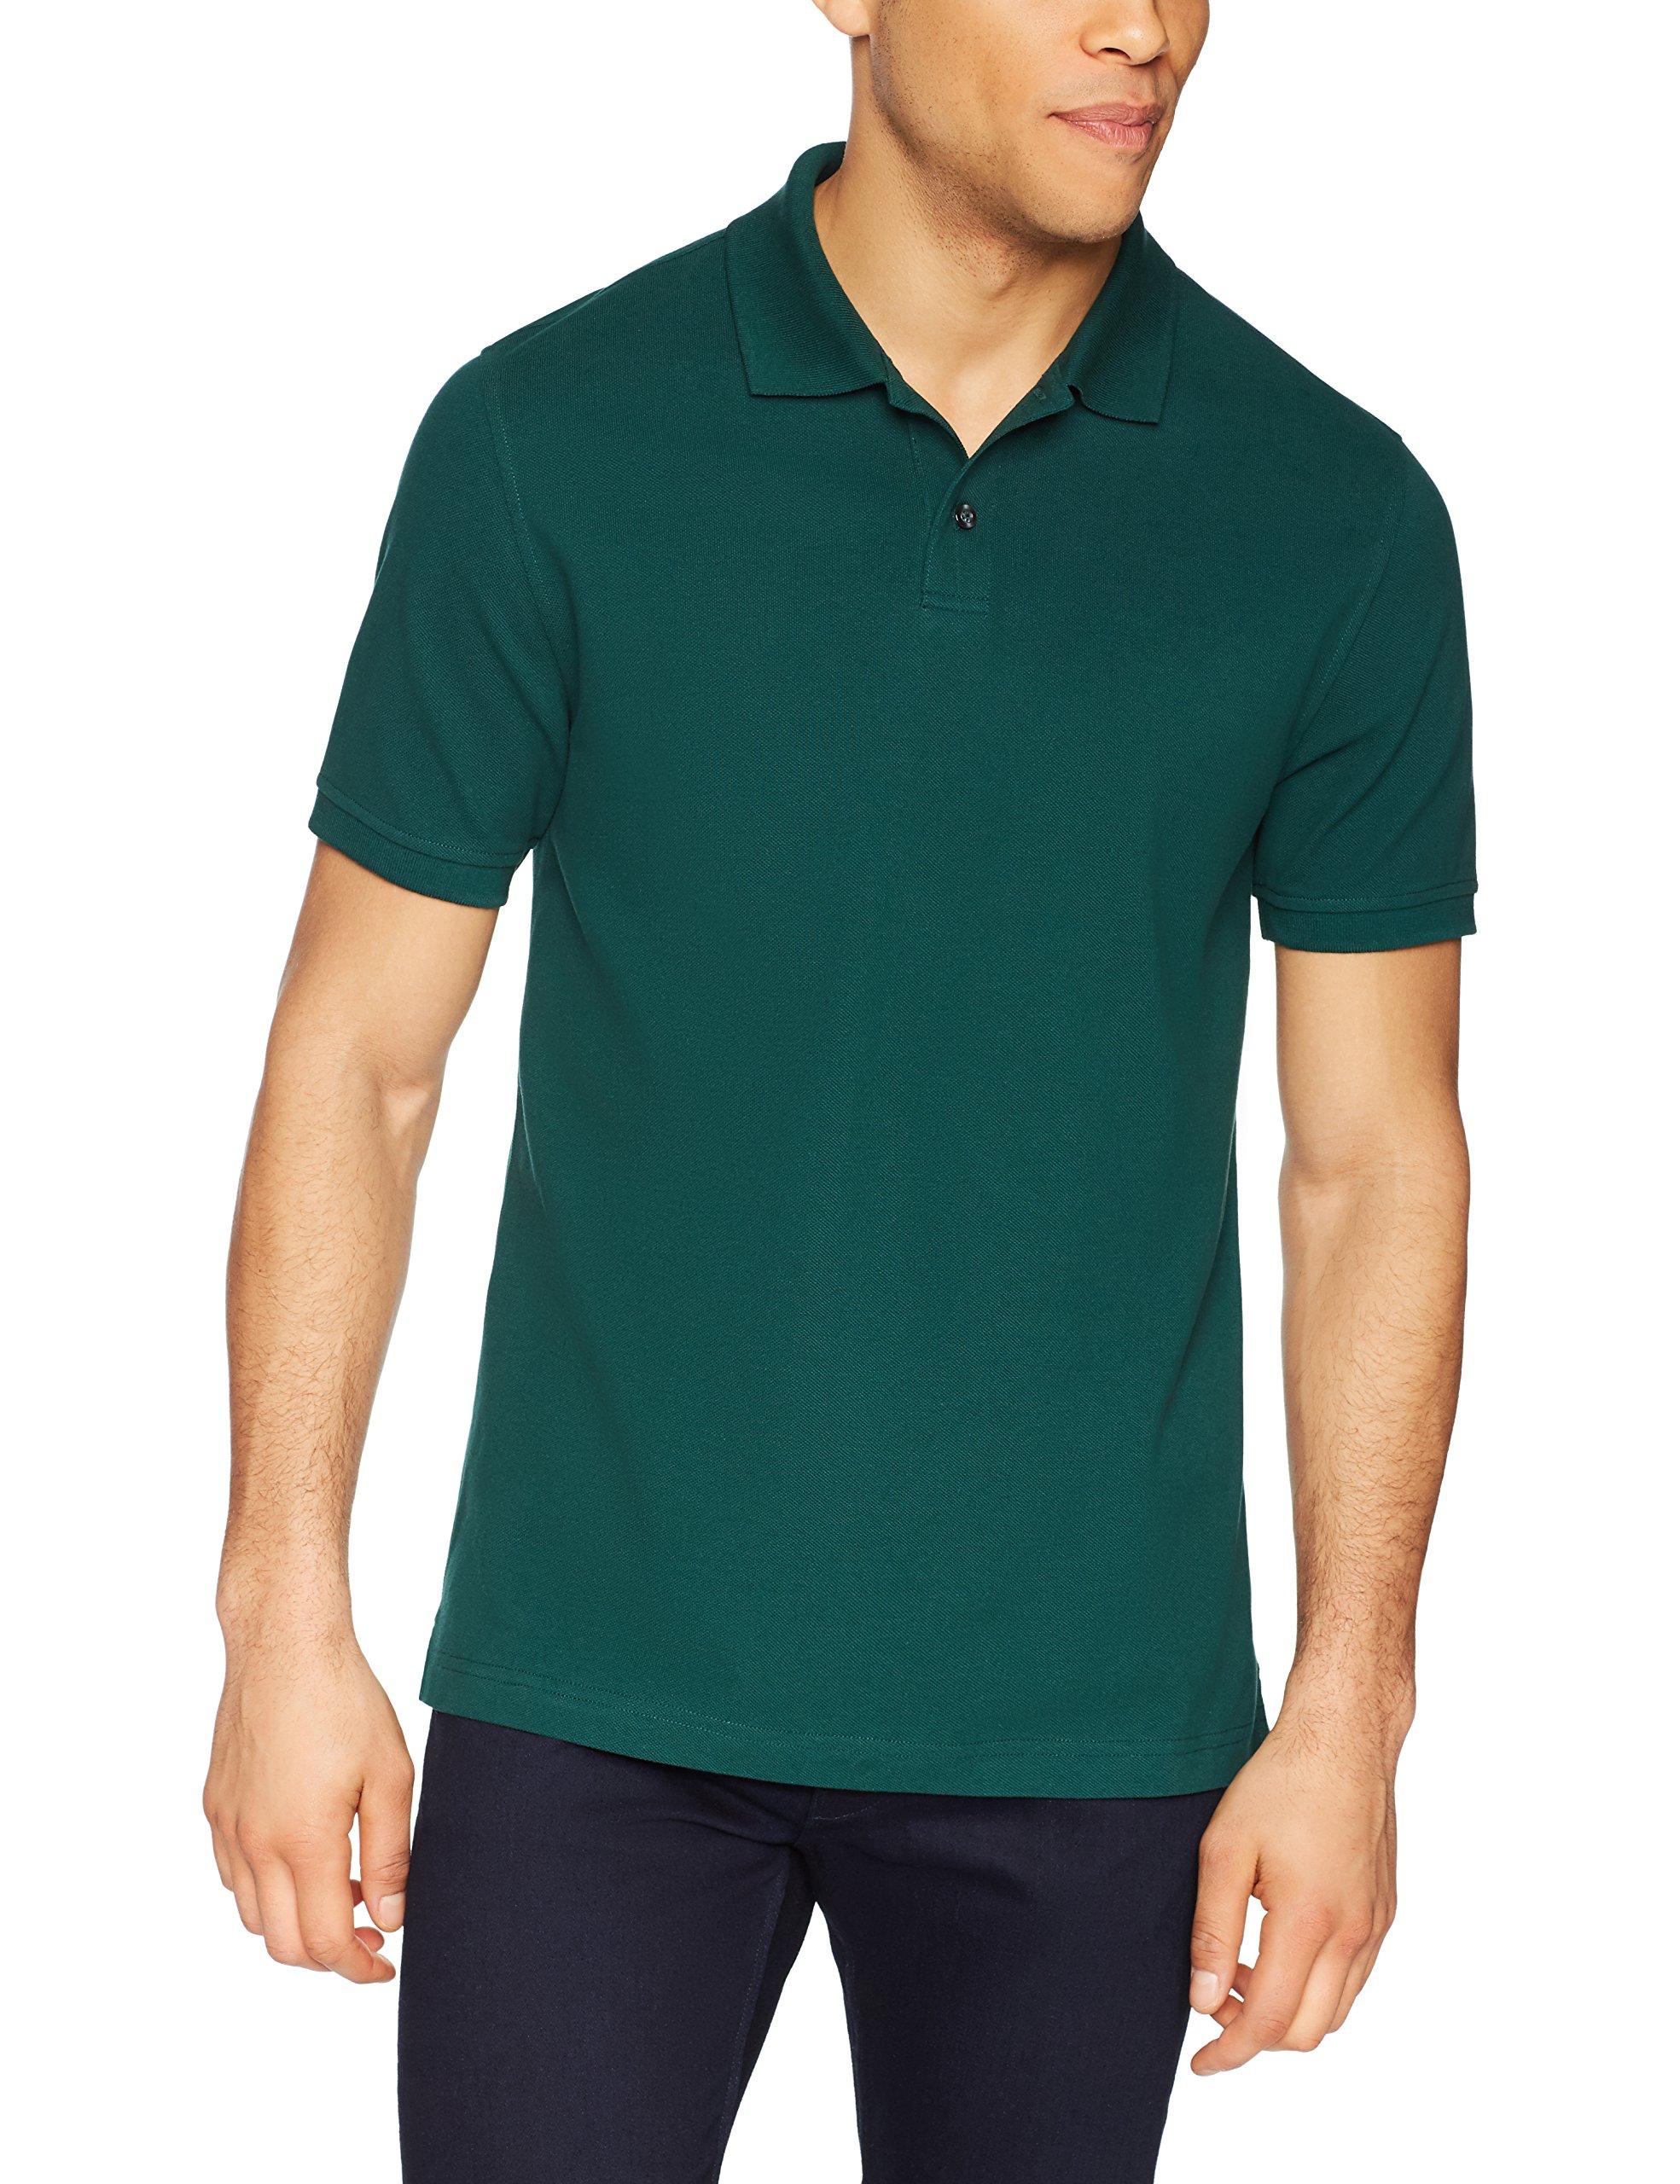 Amazon Essentials Men's Slim-Fit Cotton Pique Polo Shirt, Hunter Green, Large by Amazon Essentials (Image #3)